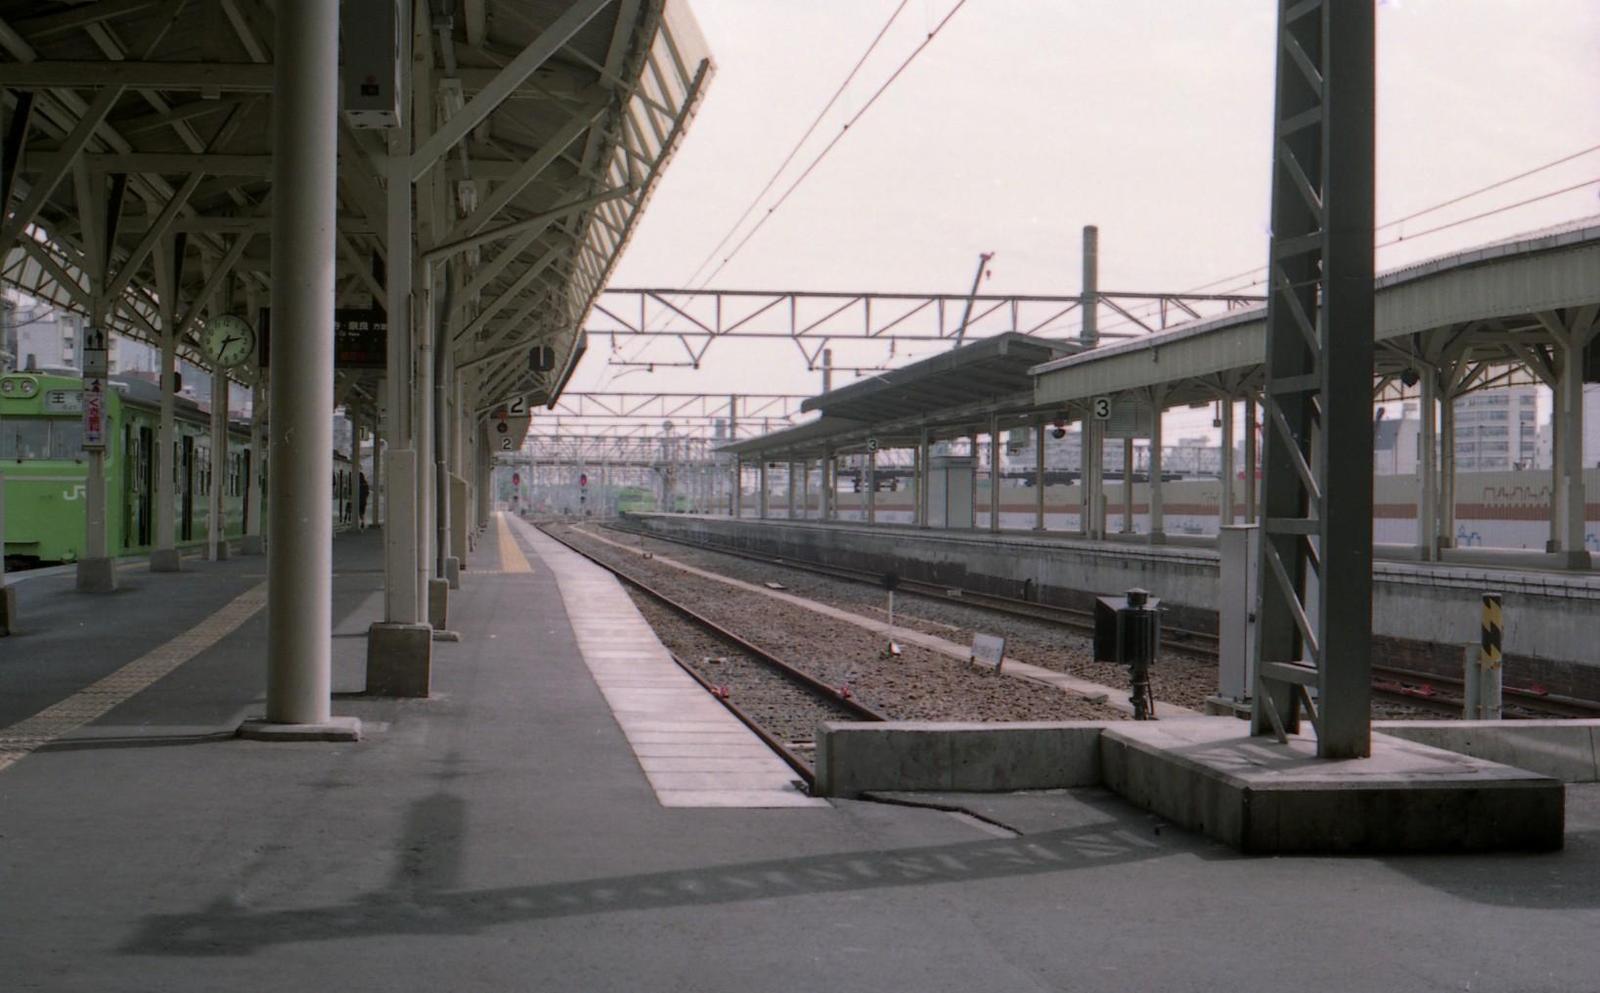 19920516g11